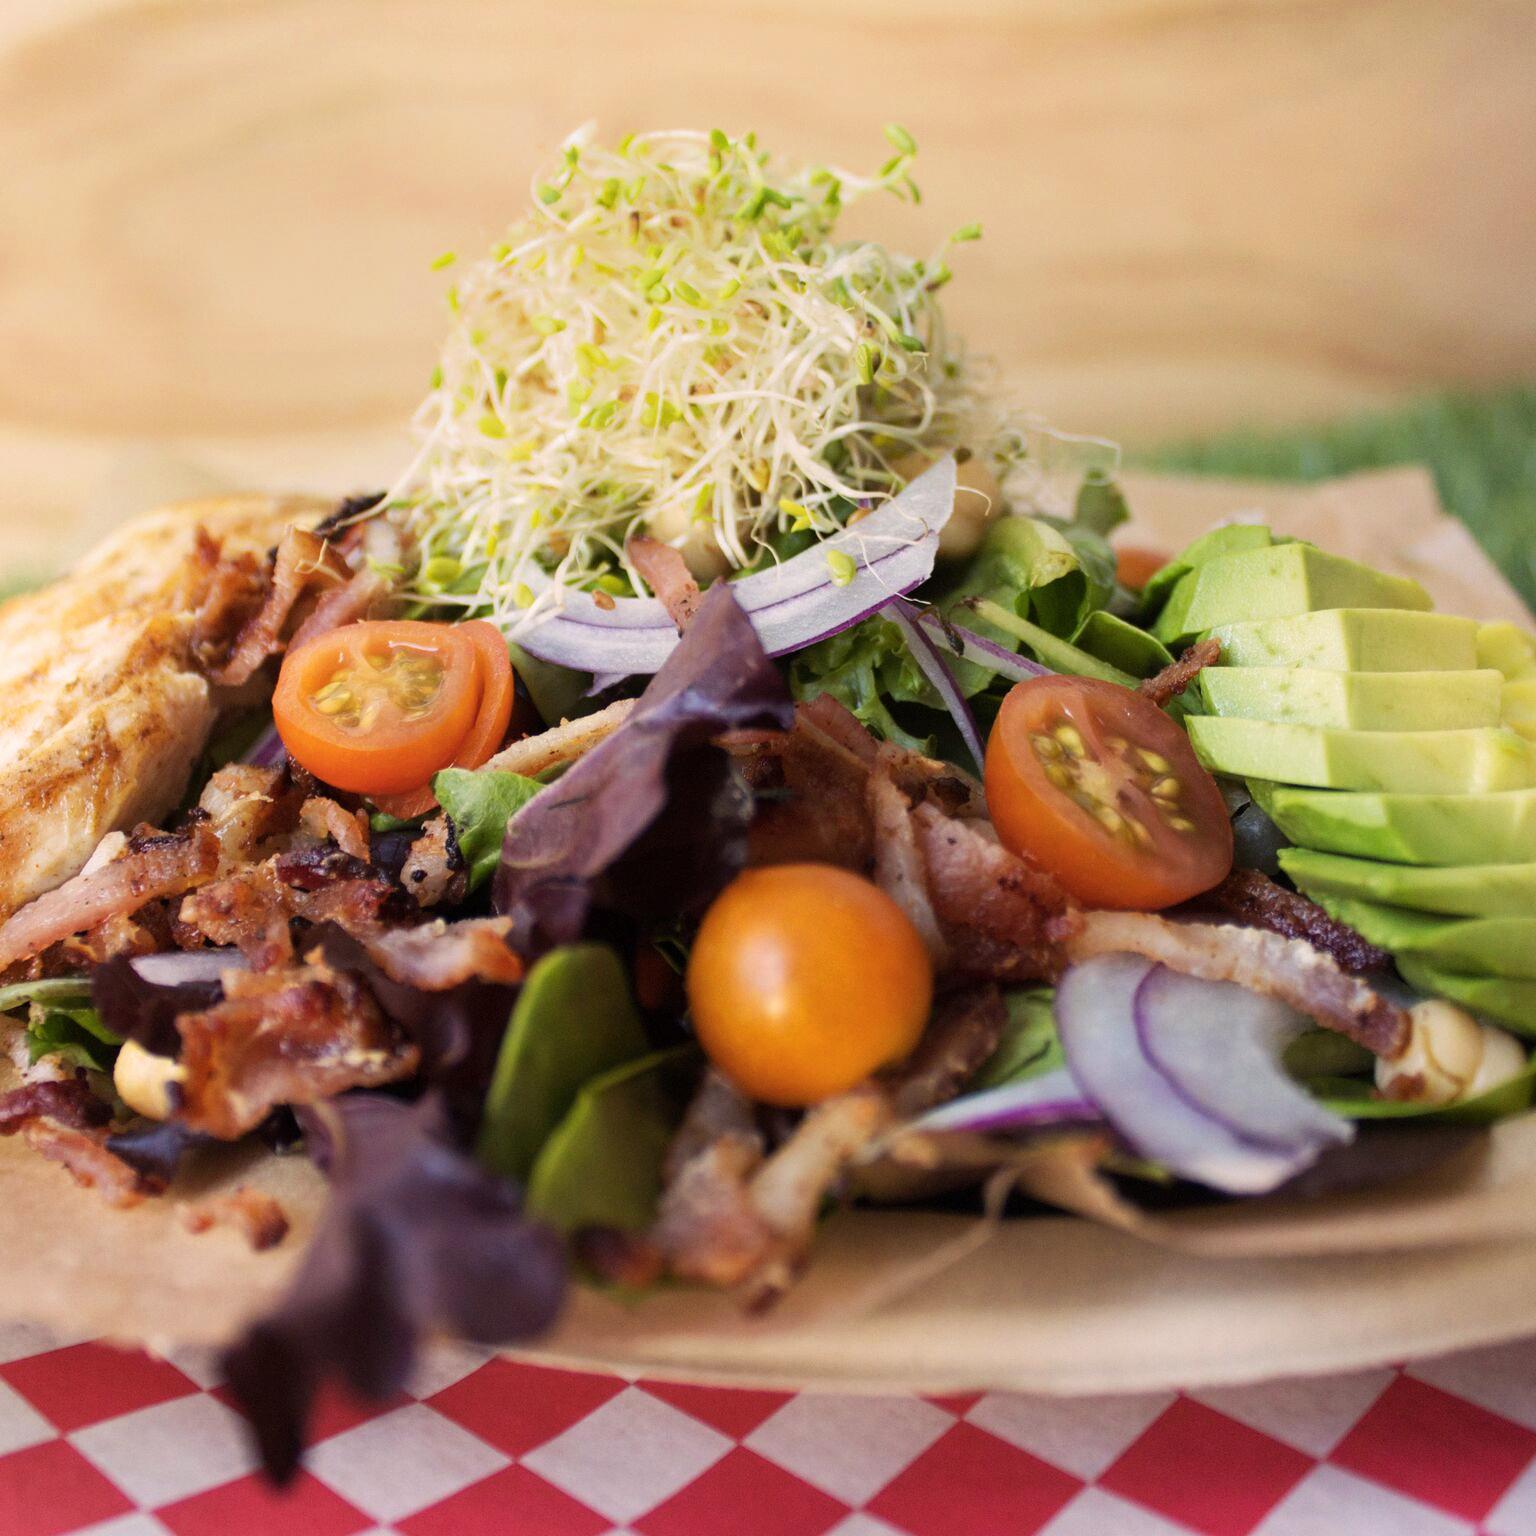 delicious salad, organic, vegetables, eat your veggies, sprouts, bacon, chicken, avocado